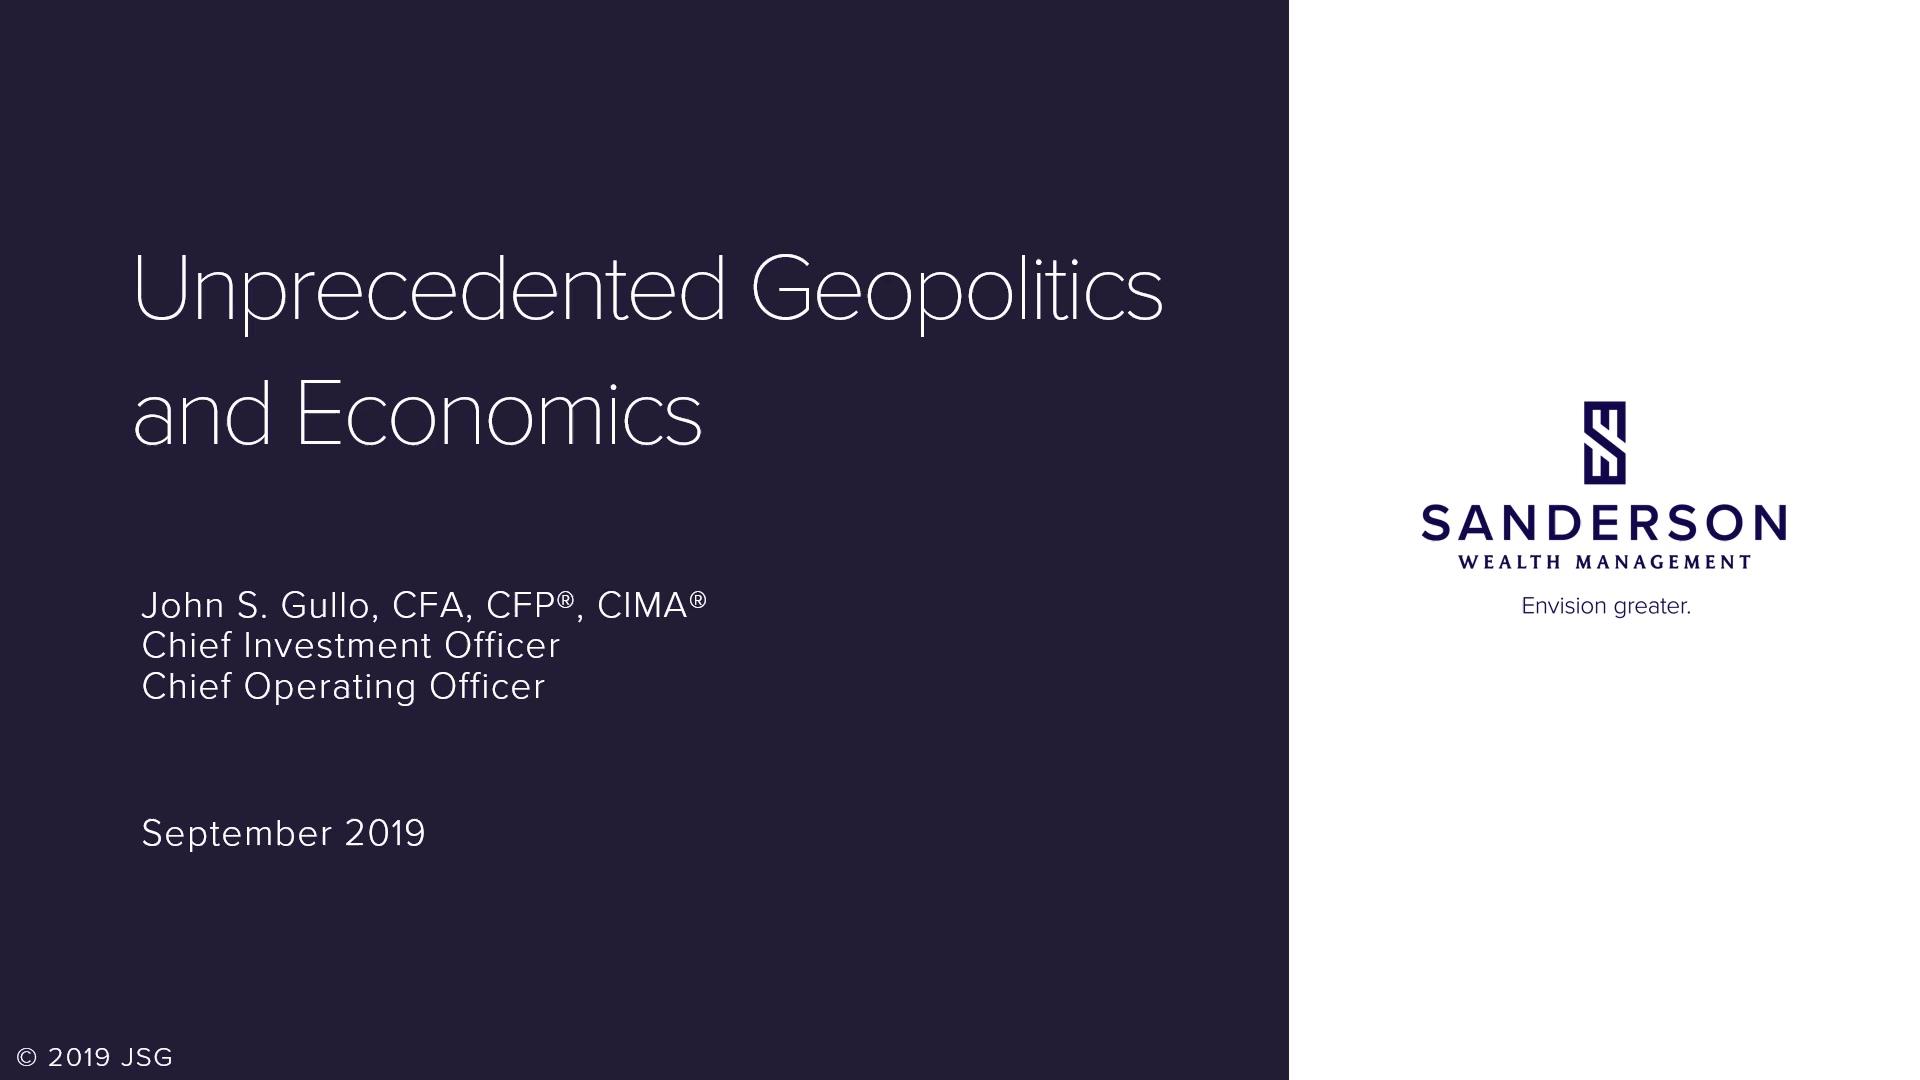 Unprecedented Geopolitics _ Economics